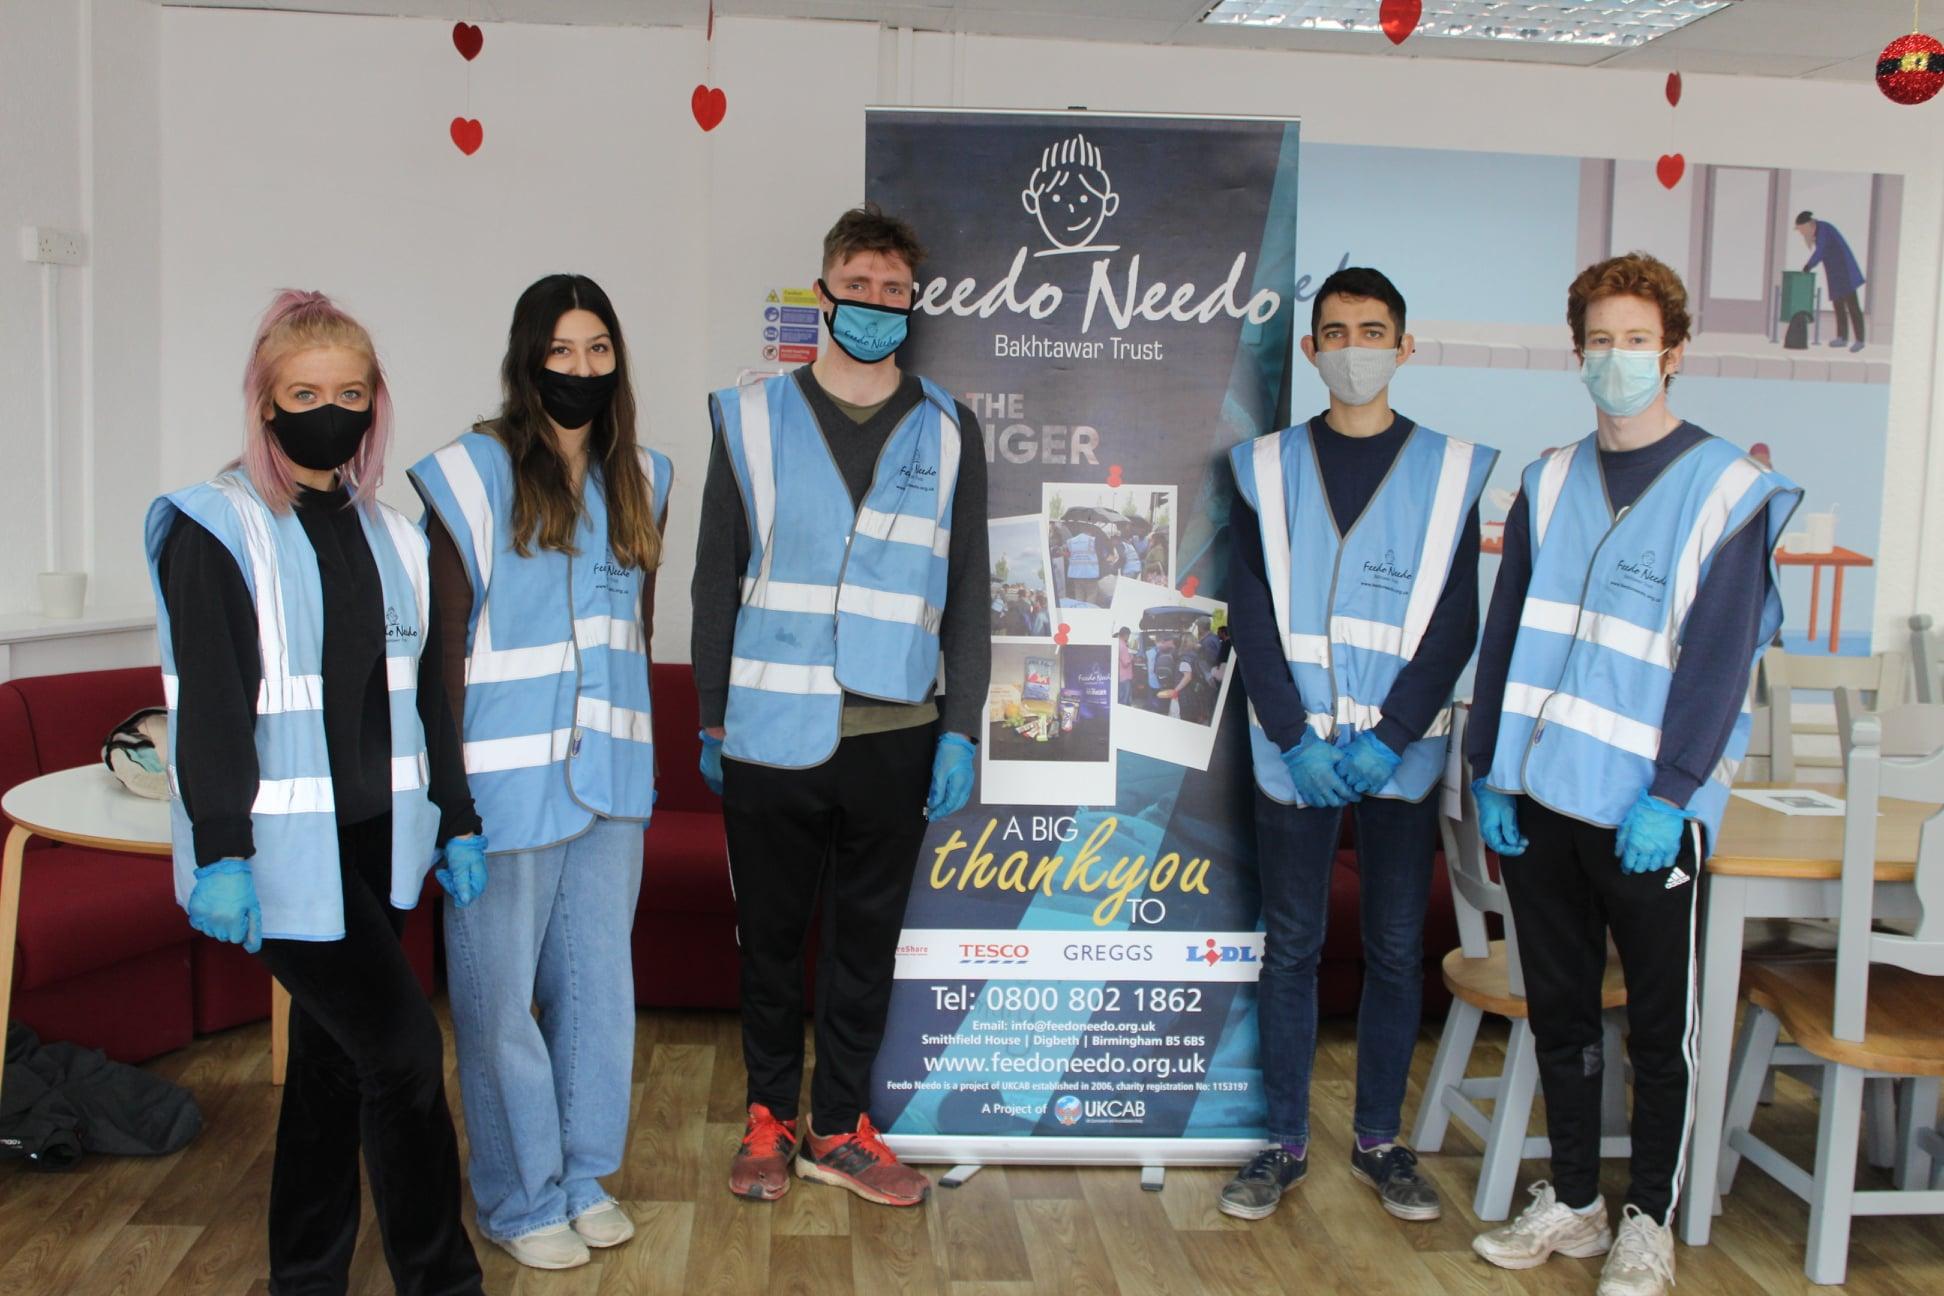 Feedo Needo wins Humanitarian accolade in final of Charity Today Awards